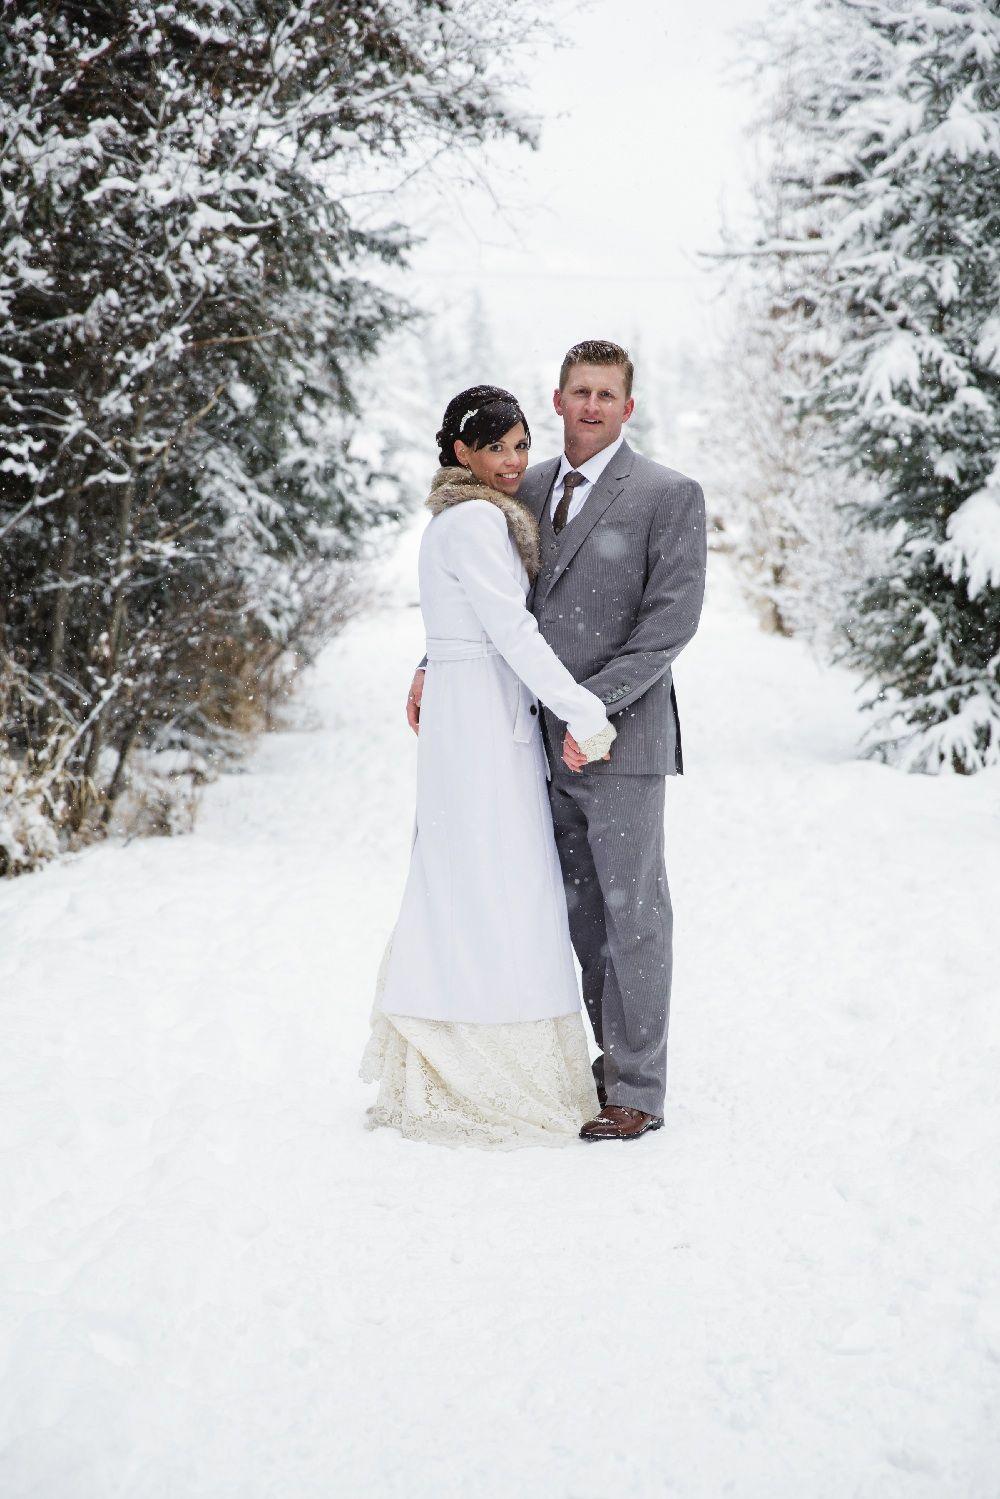 Winter wonderland wedding dress  A Rustic Winter Wedding in Canmore Alberta  Photos for wedding